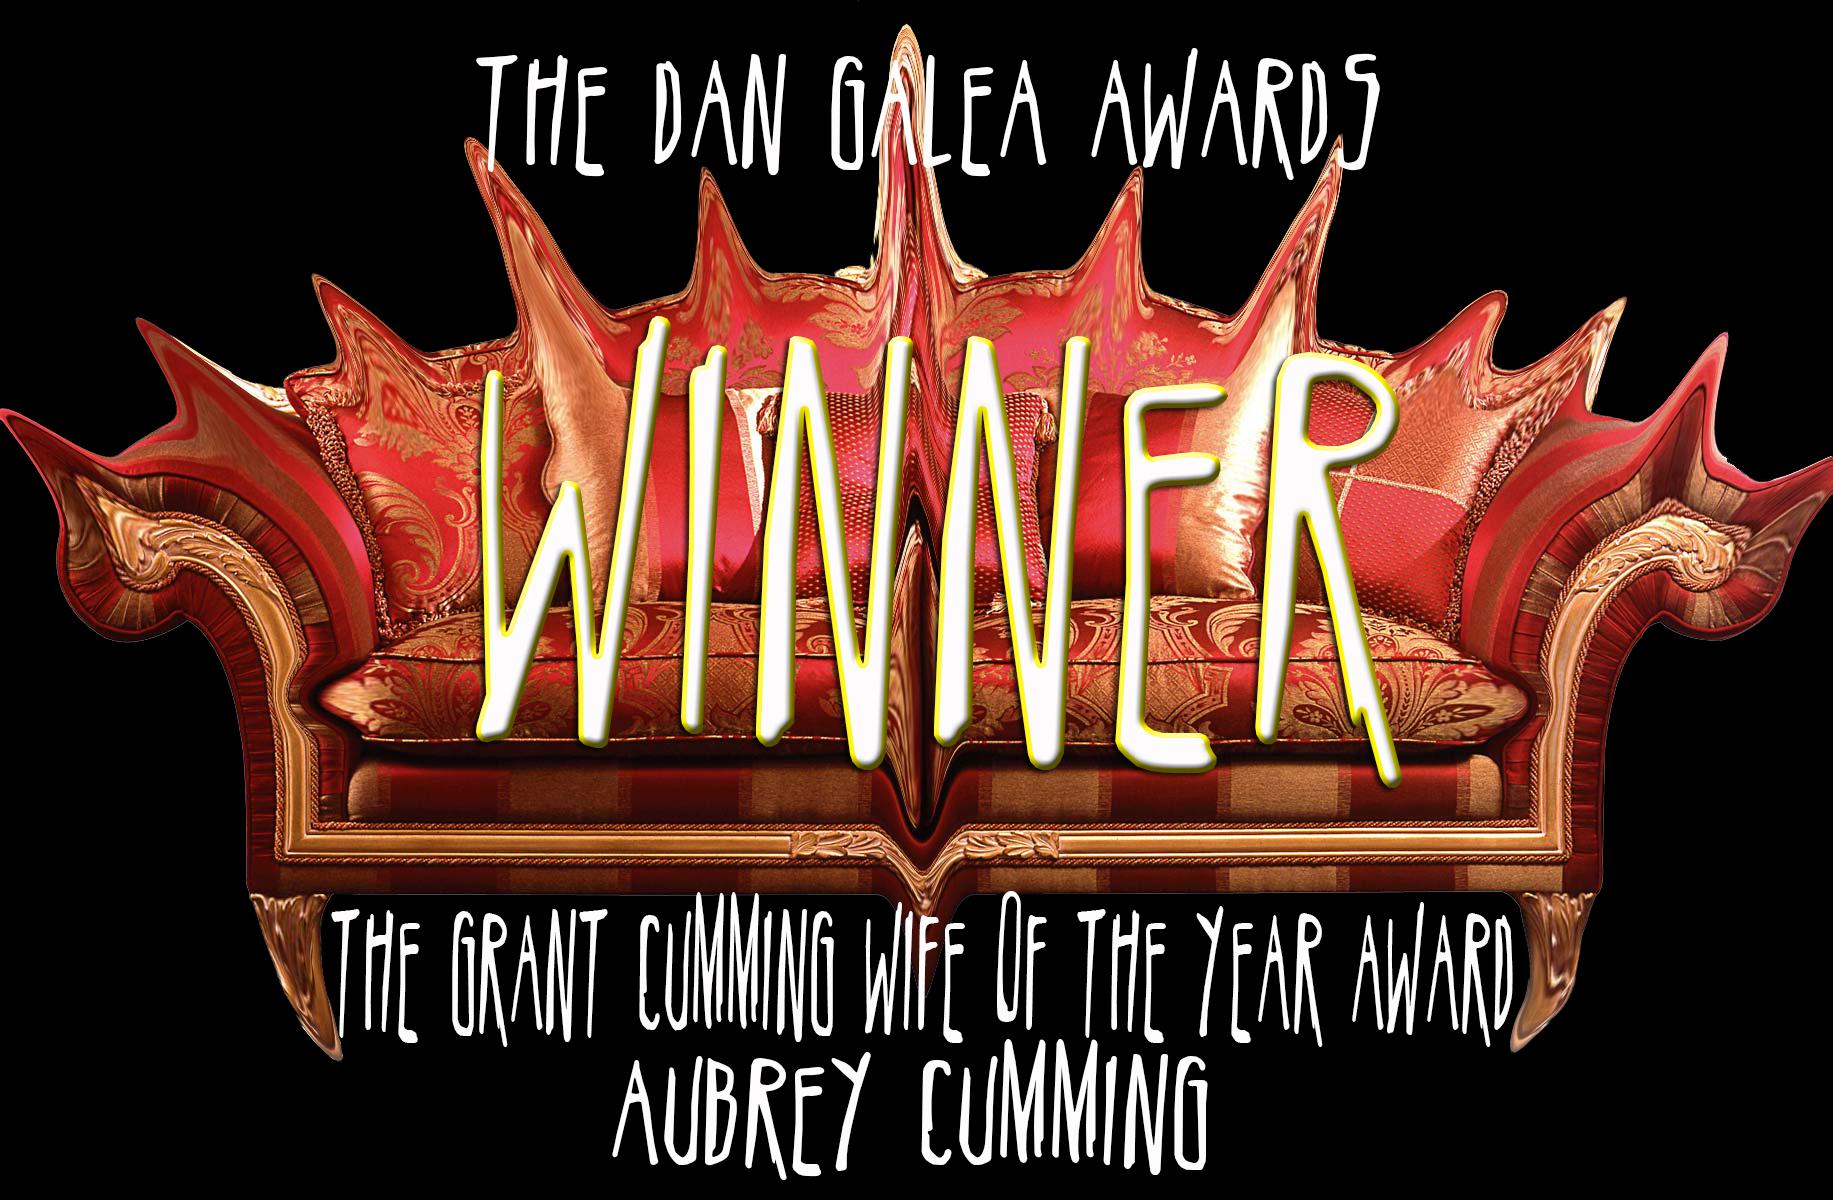 DGawards Aubrey Go.jpg